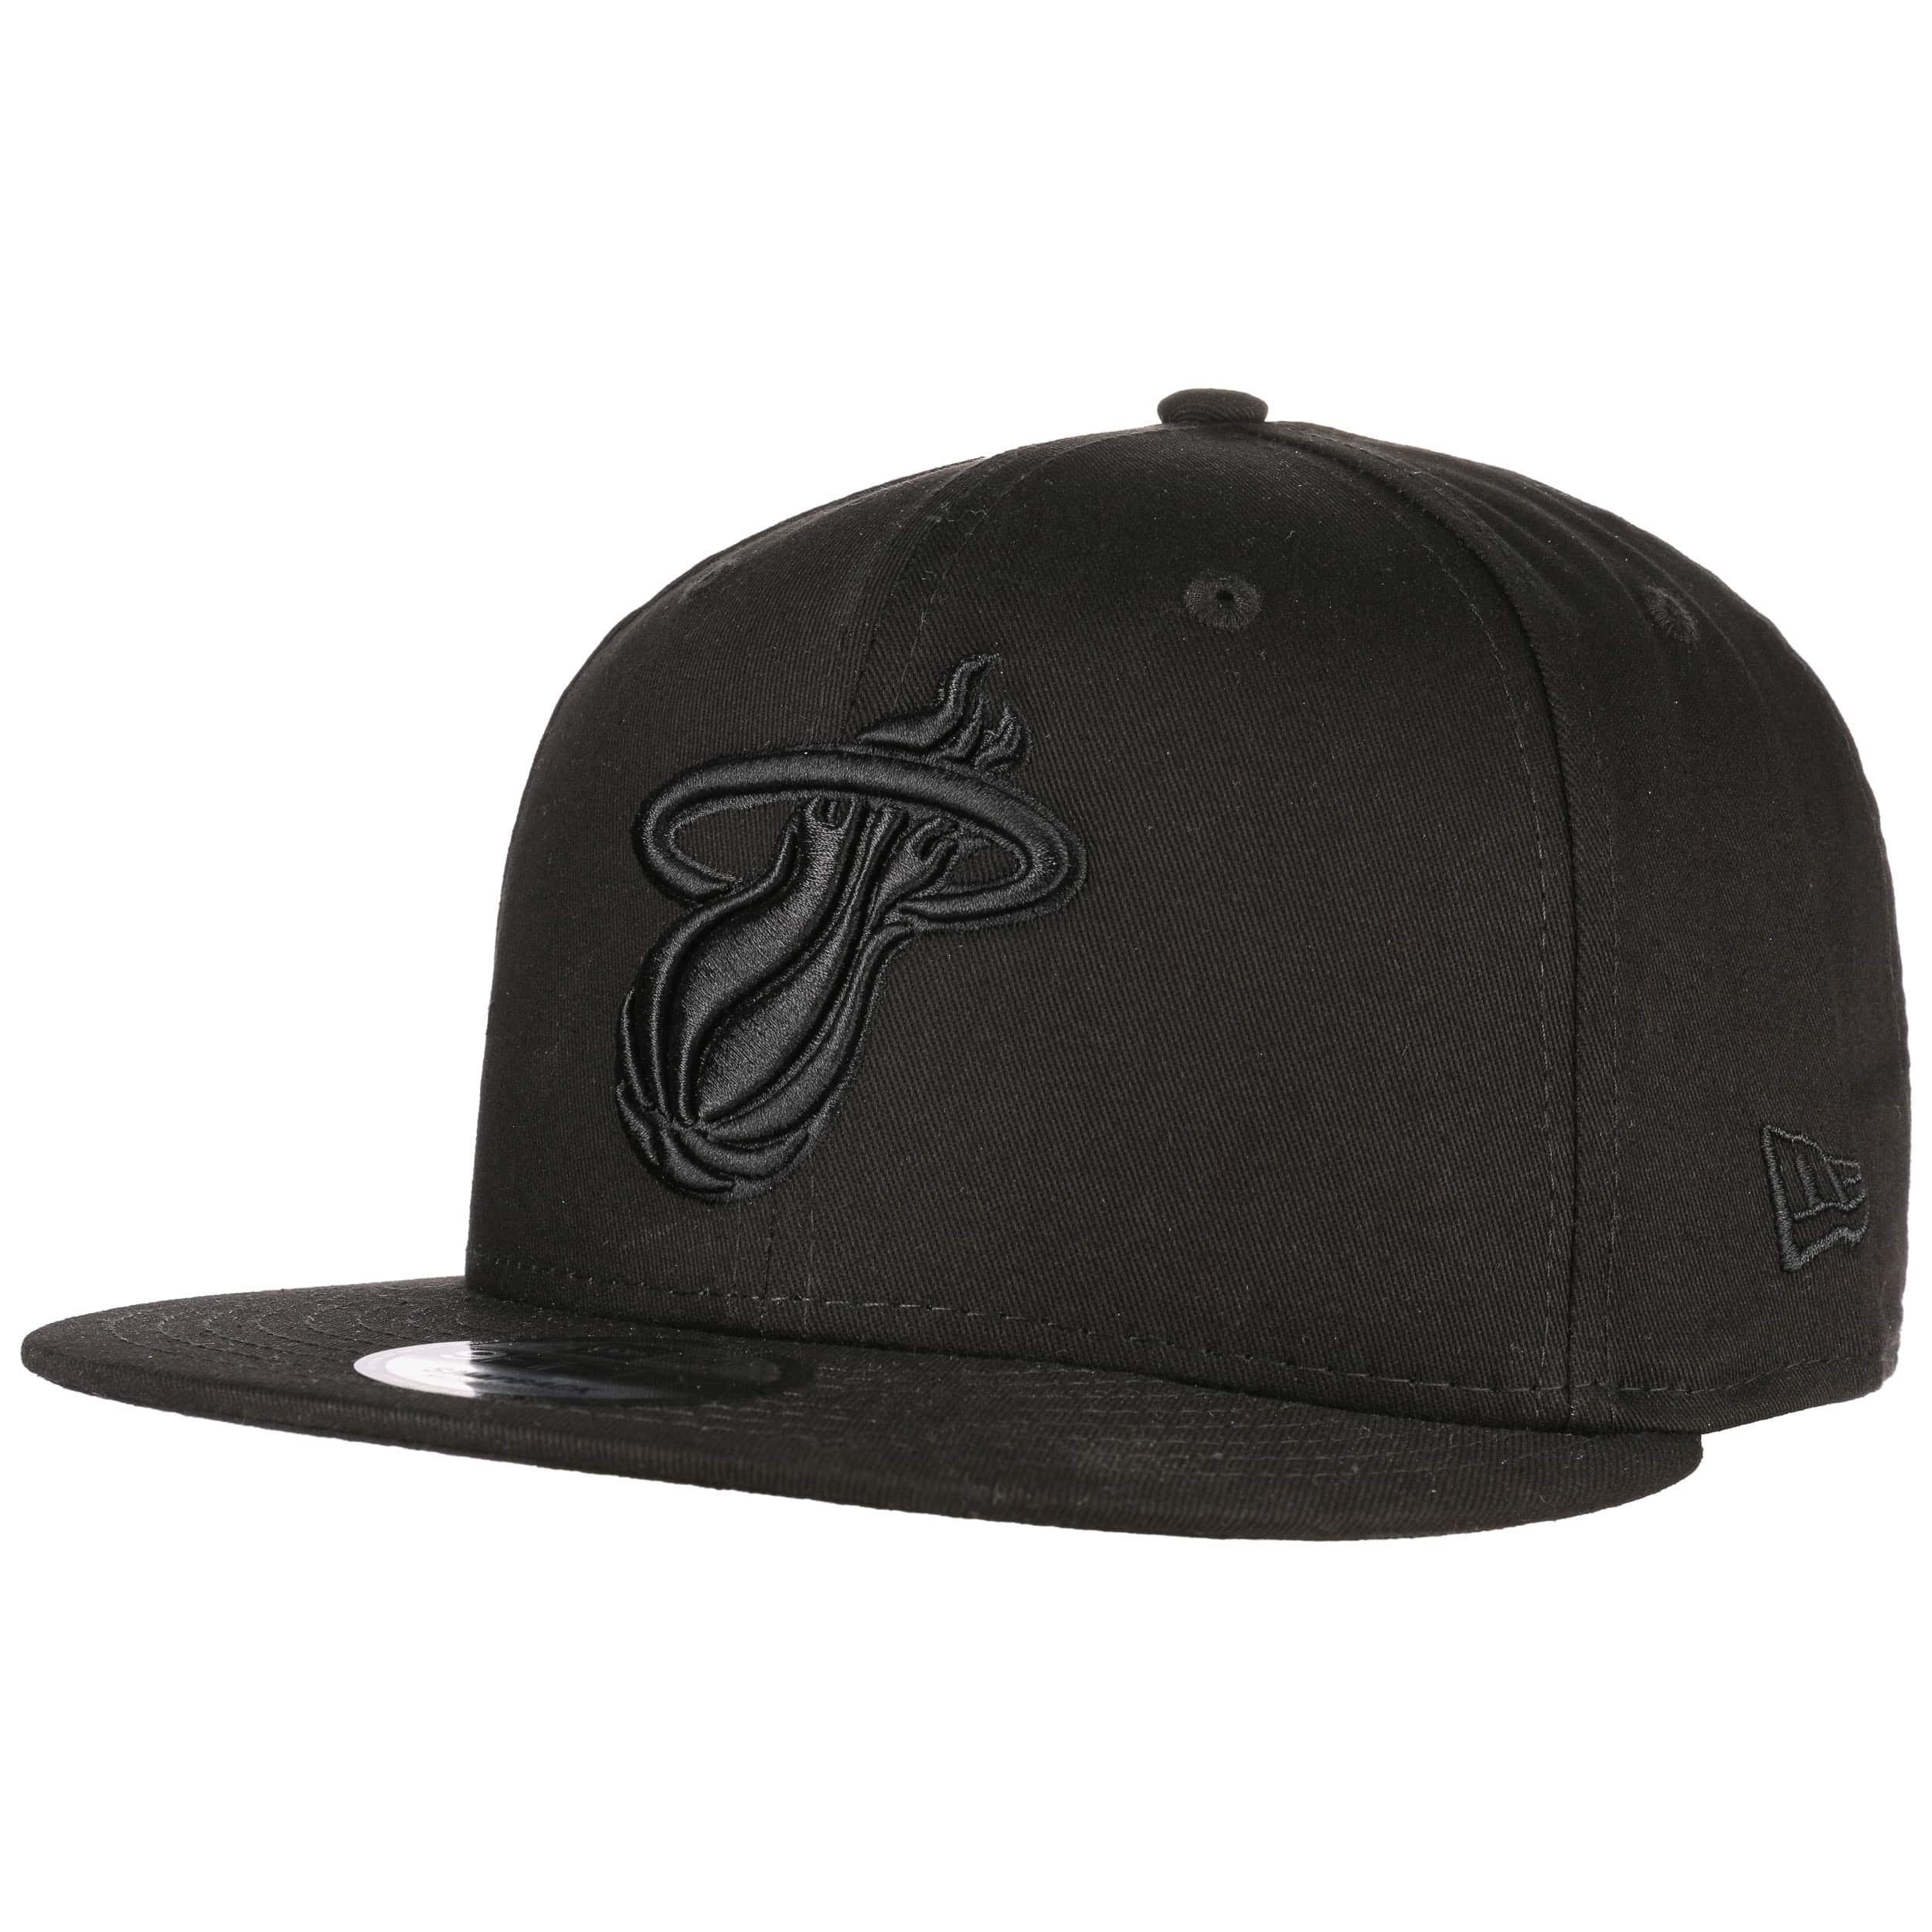 9fifty miami heat bob cap by new era eur 22 95 hats caps beanies shop online. Black Bedroom Furniture Sets. Home Design Ideas